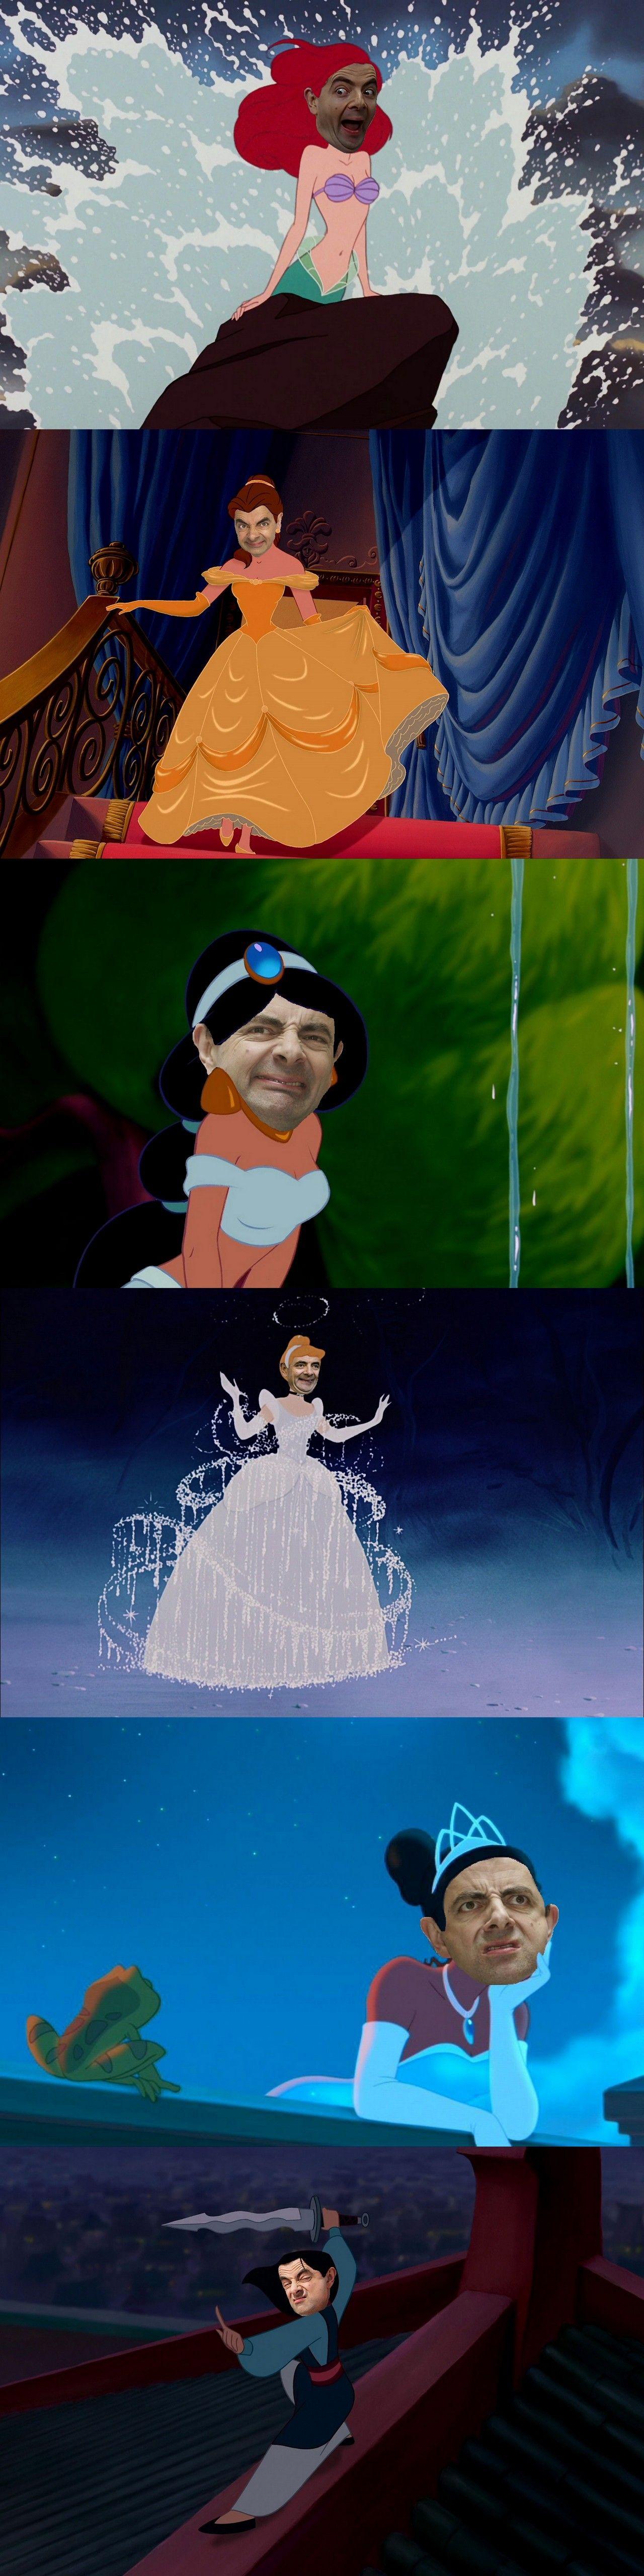 Mr Bean Disney Princesses Disney Princess Funny Disney Princess Memes Mr Bean Funny